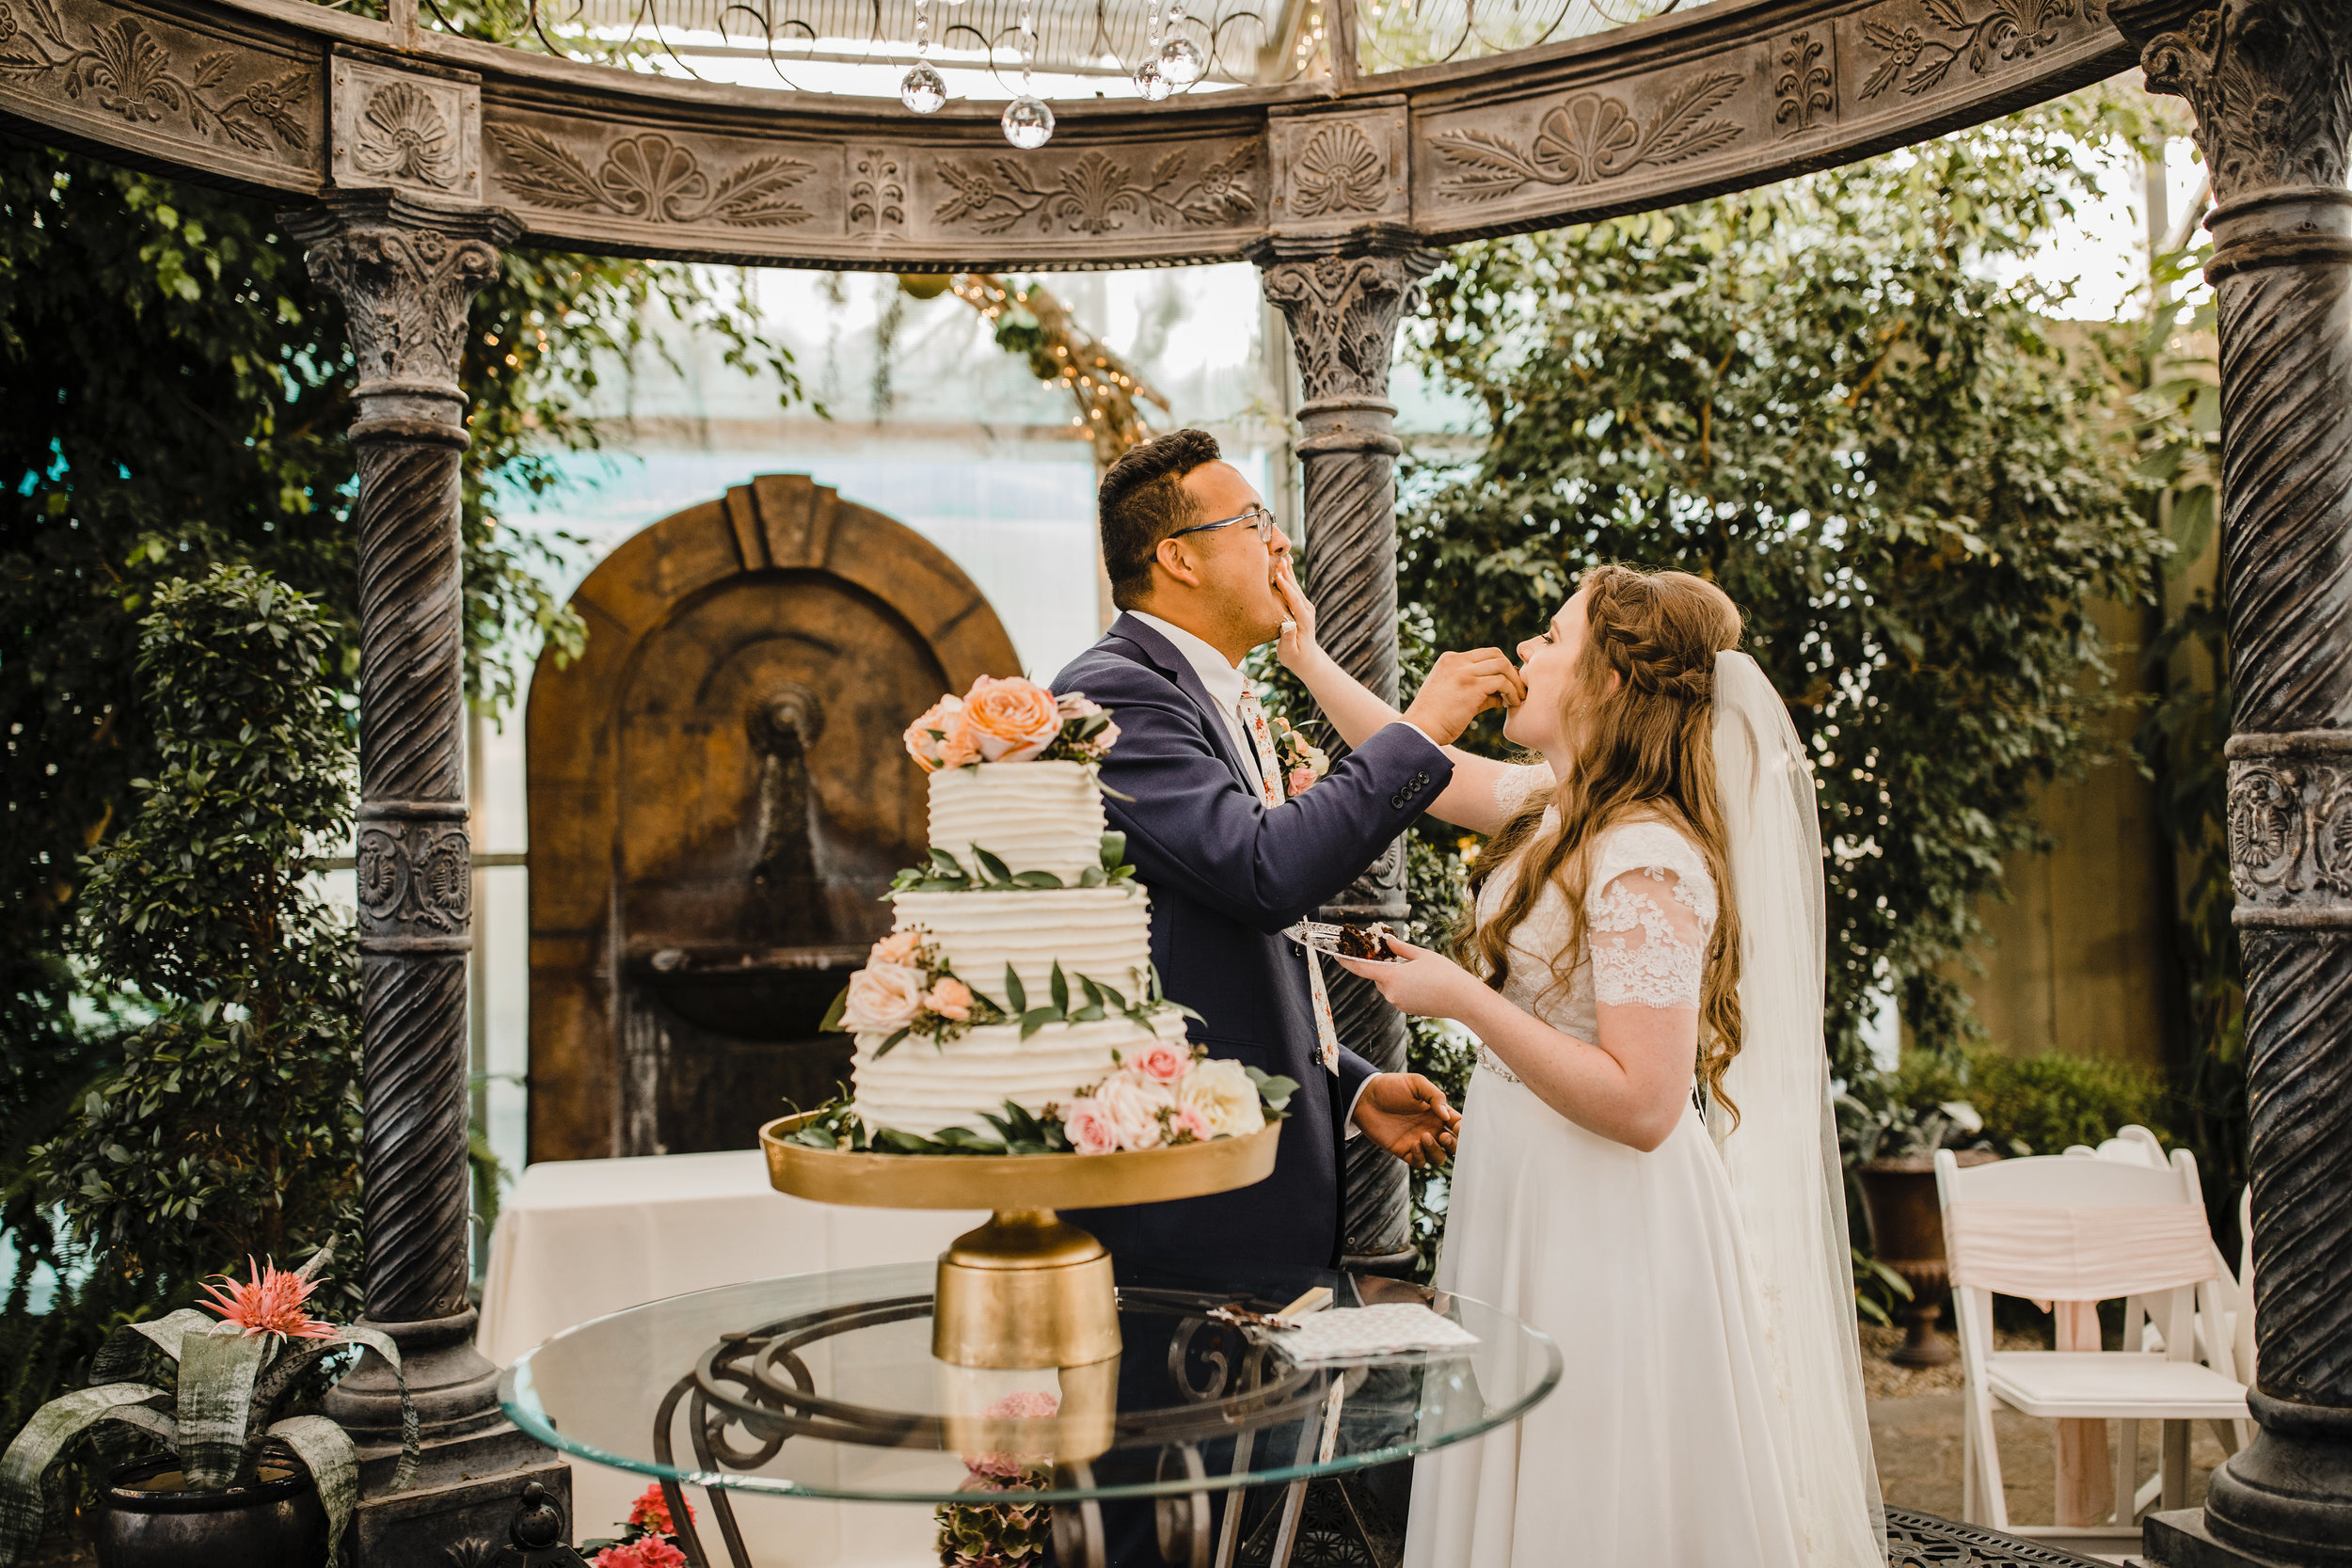 salt lake city wedding photographer reception happy cake feeding blush flowers